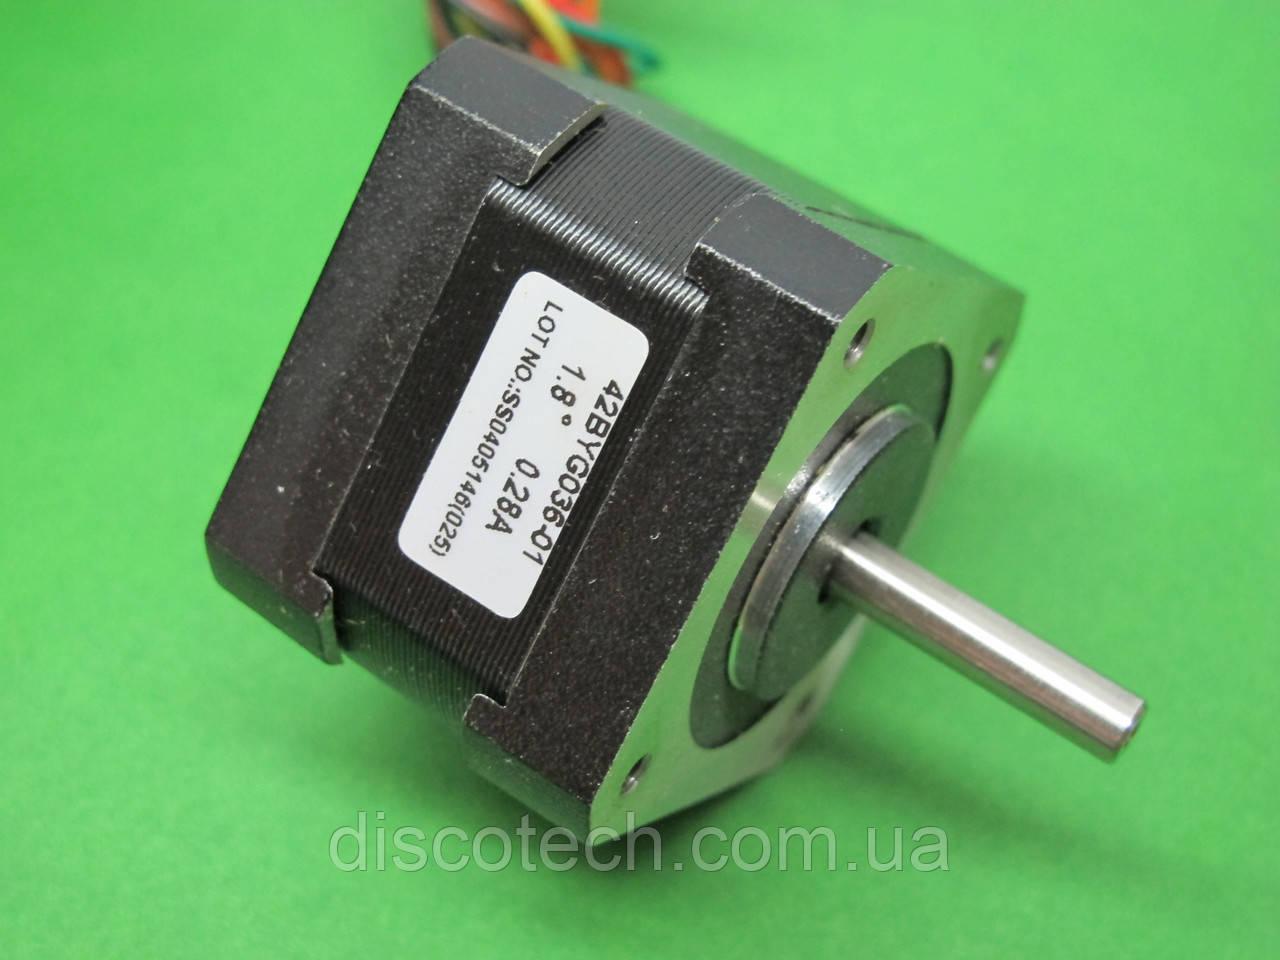 Двигатель шаговый уп 1,8 ф5,0/ 45 Ом Stepping Motor 42BYG036-01